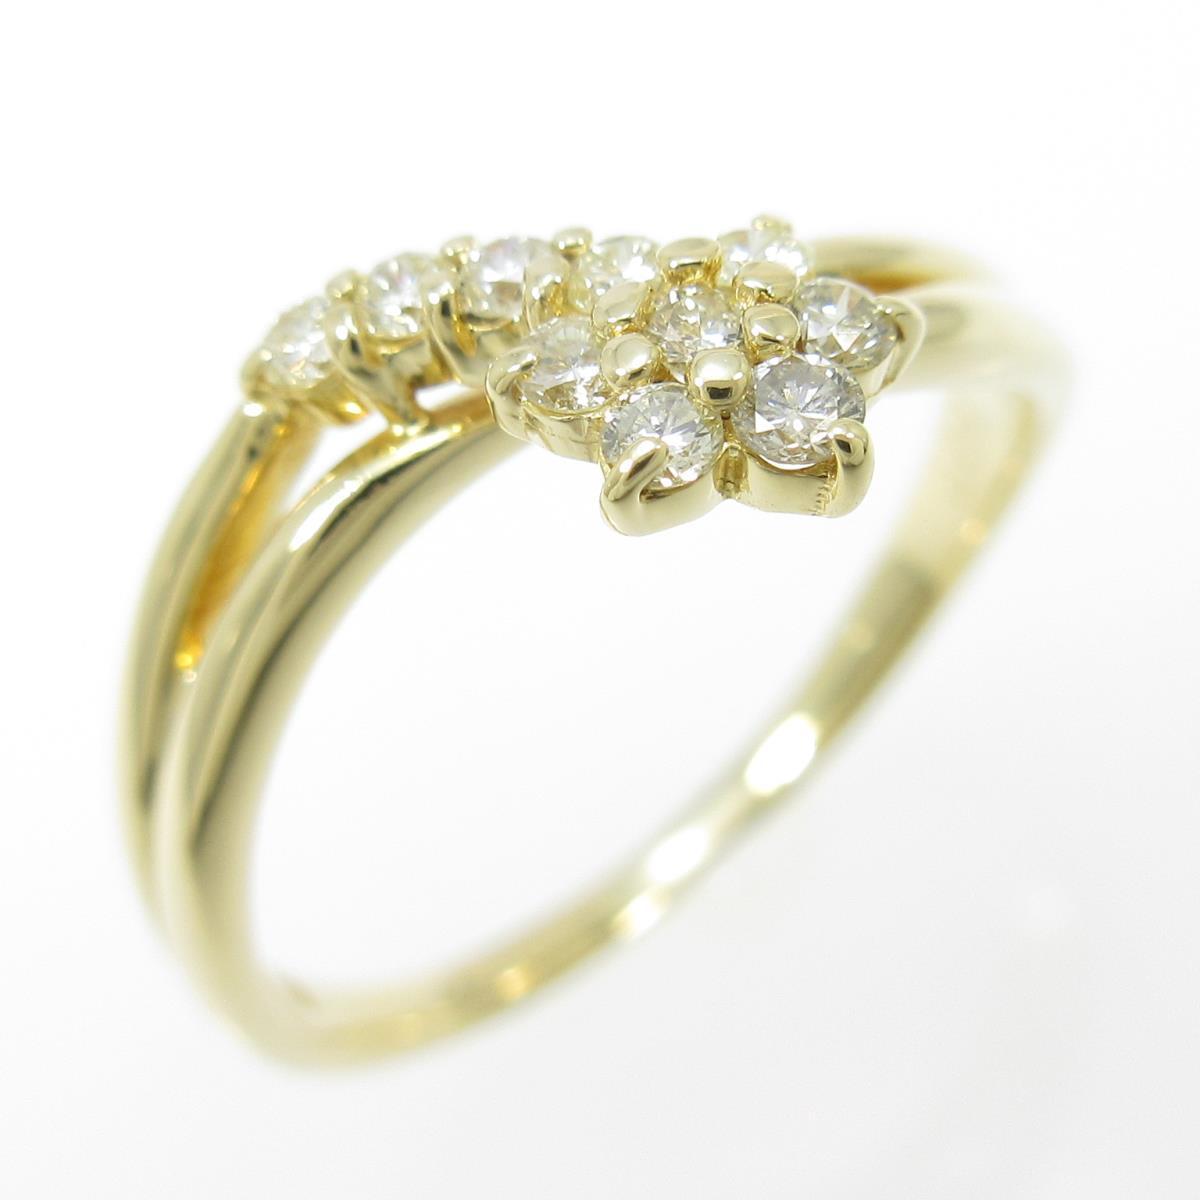 K18YG フラワー ダイヤモンドリング